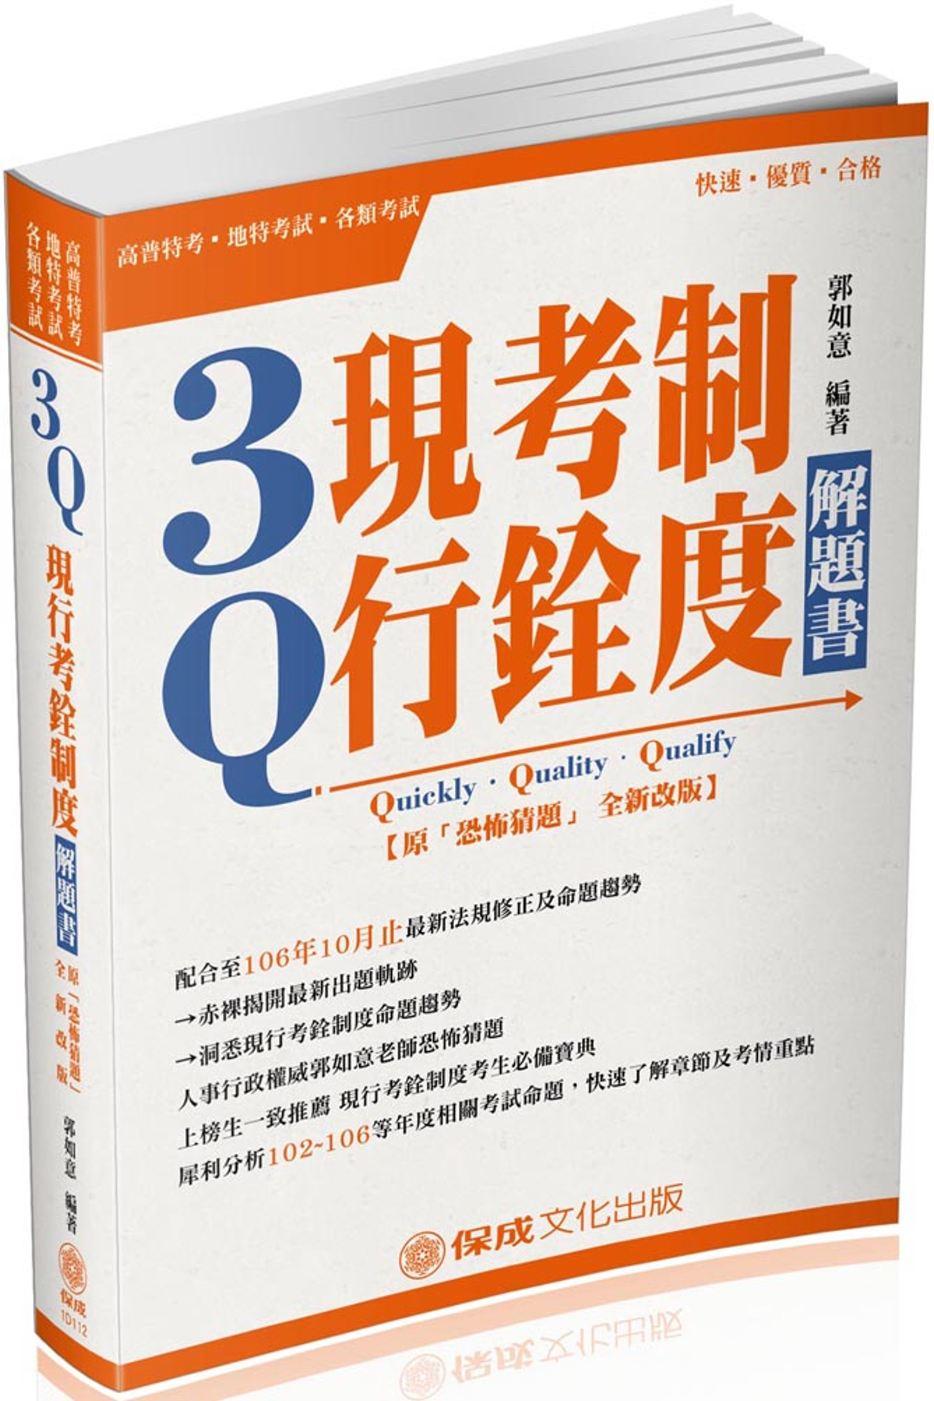 3Q現行考銓制度-解題書(原:恐怖猜題)-2018高普特考<保成>(十一版)